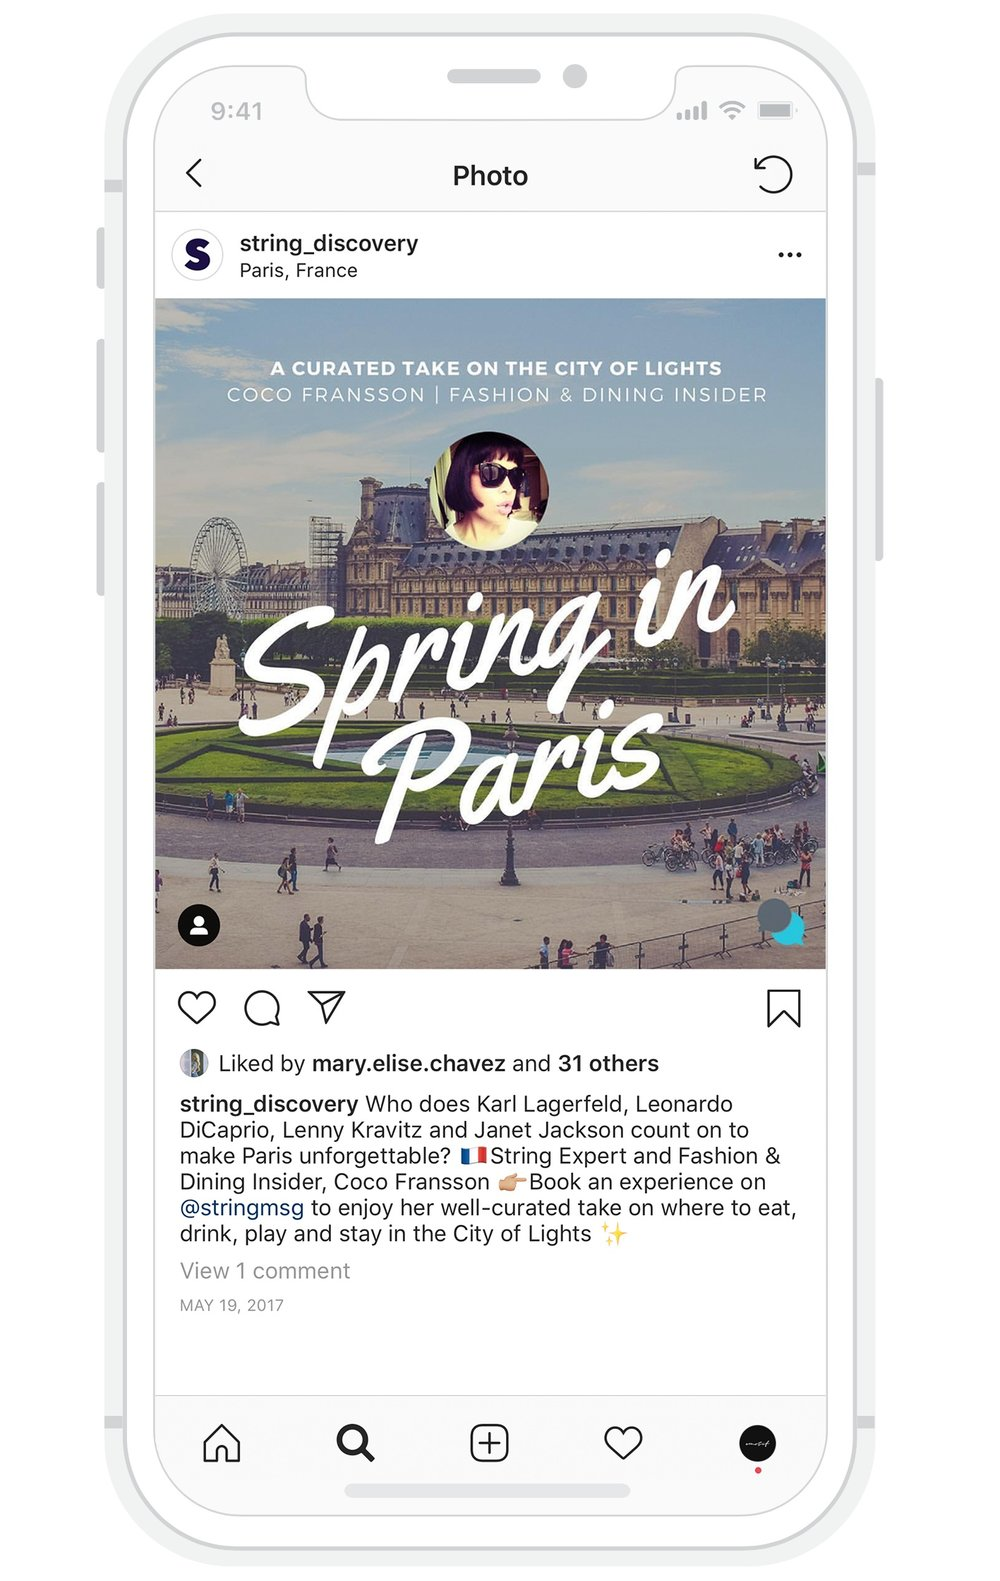 Emotif - Mobile App UX and Design